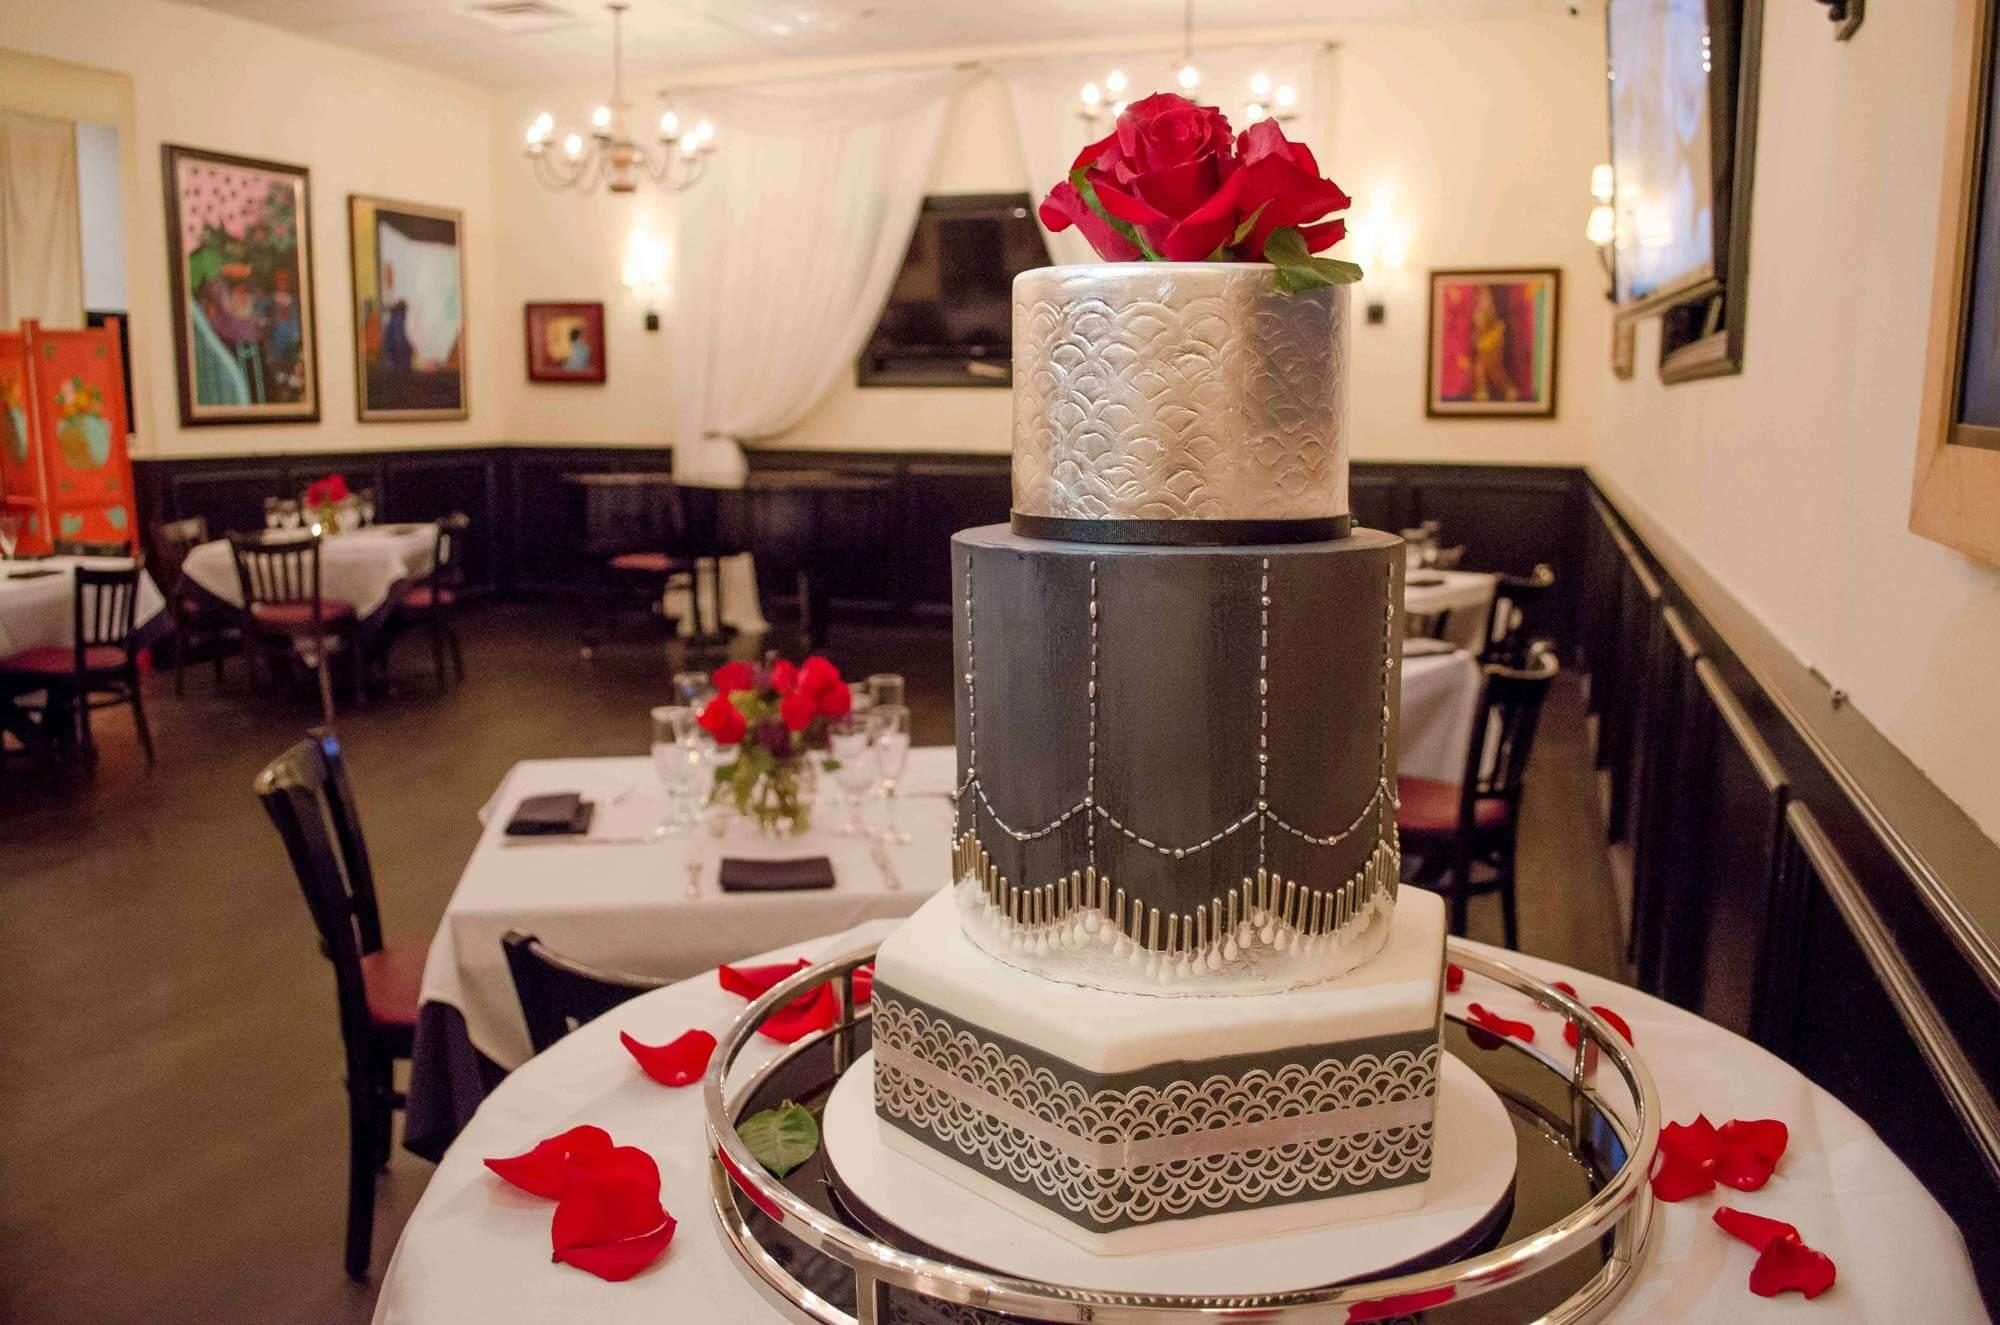 Weddin cake w room bkgrnd